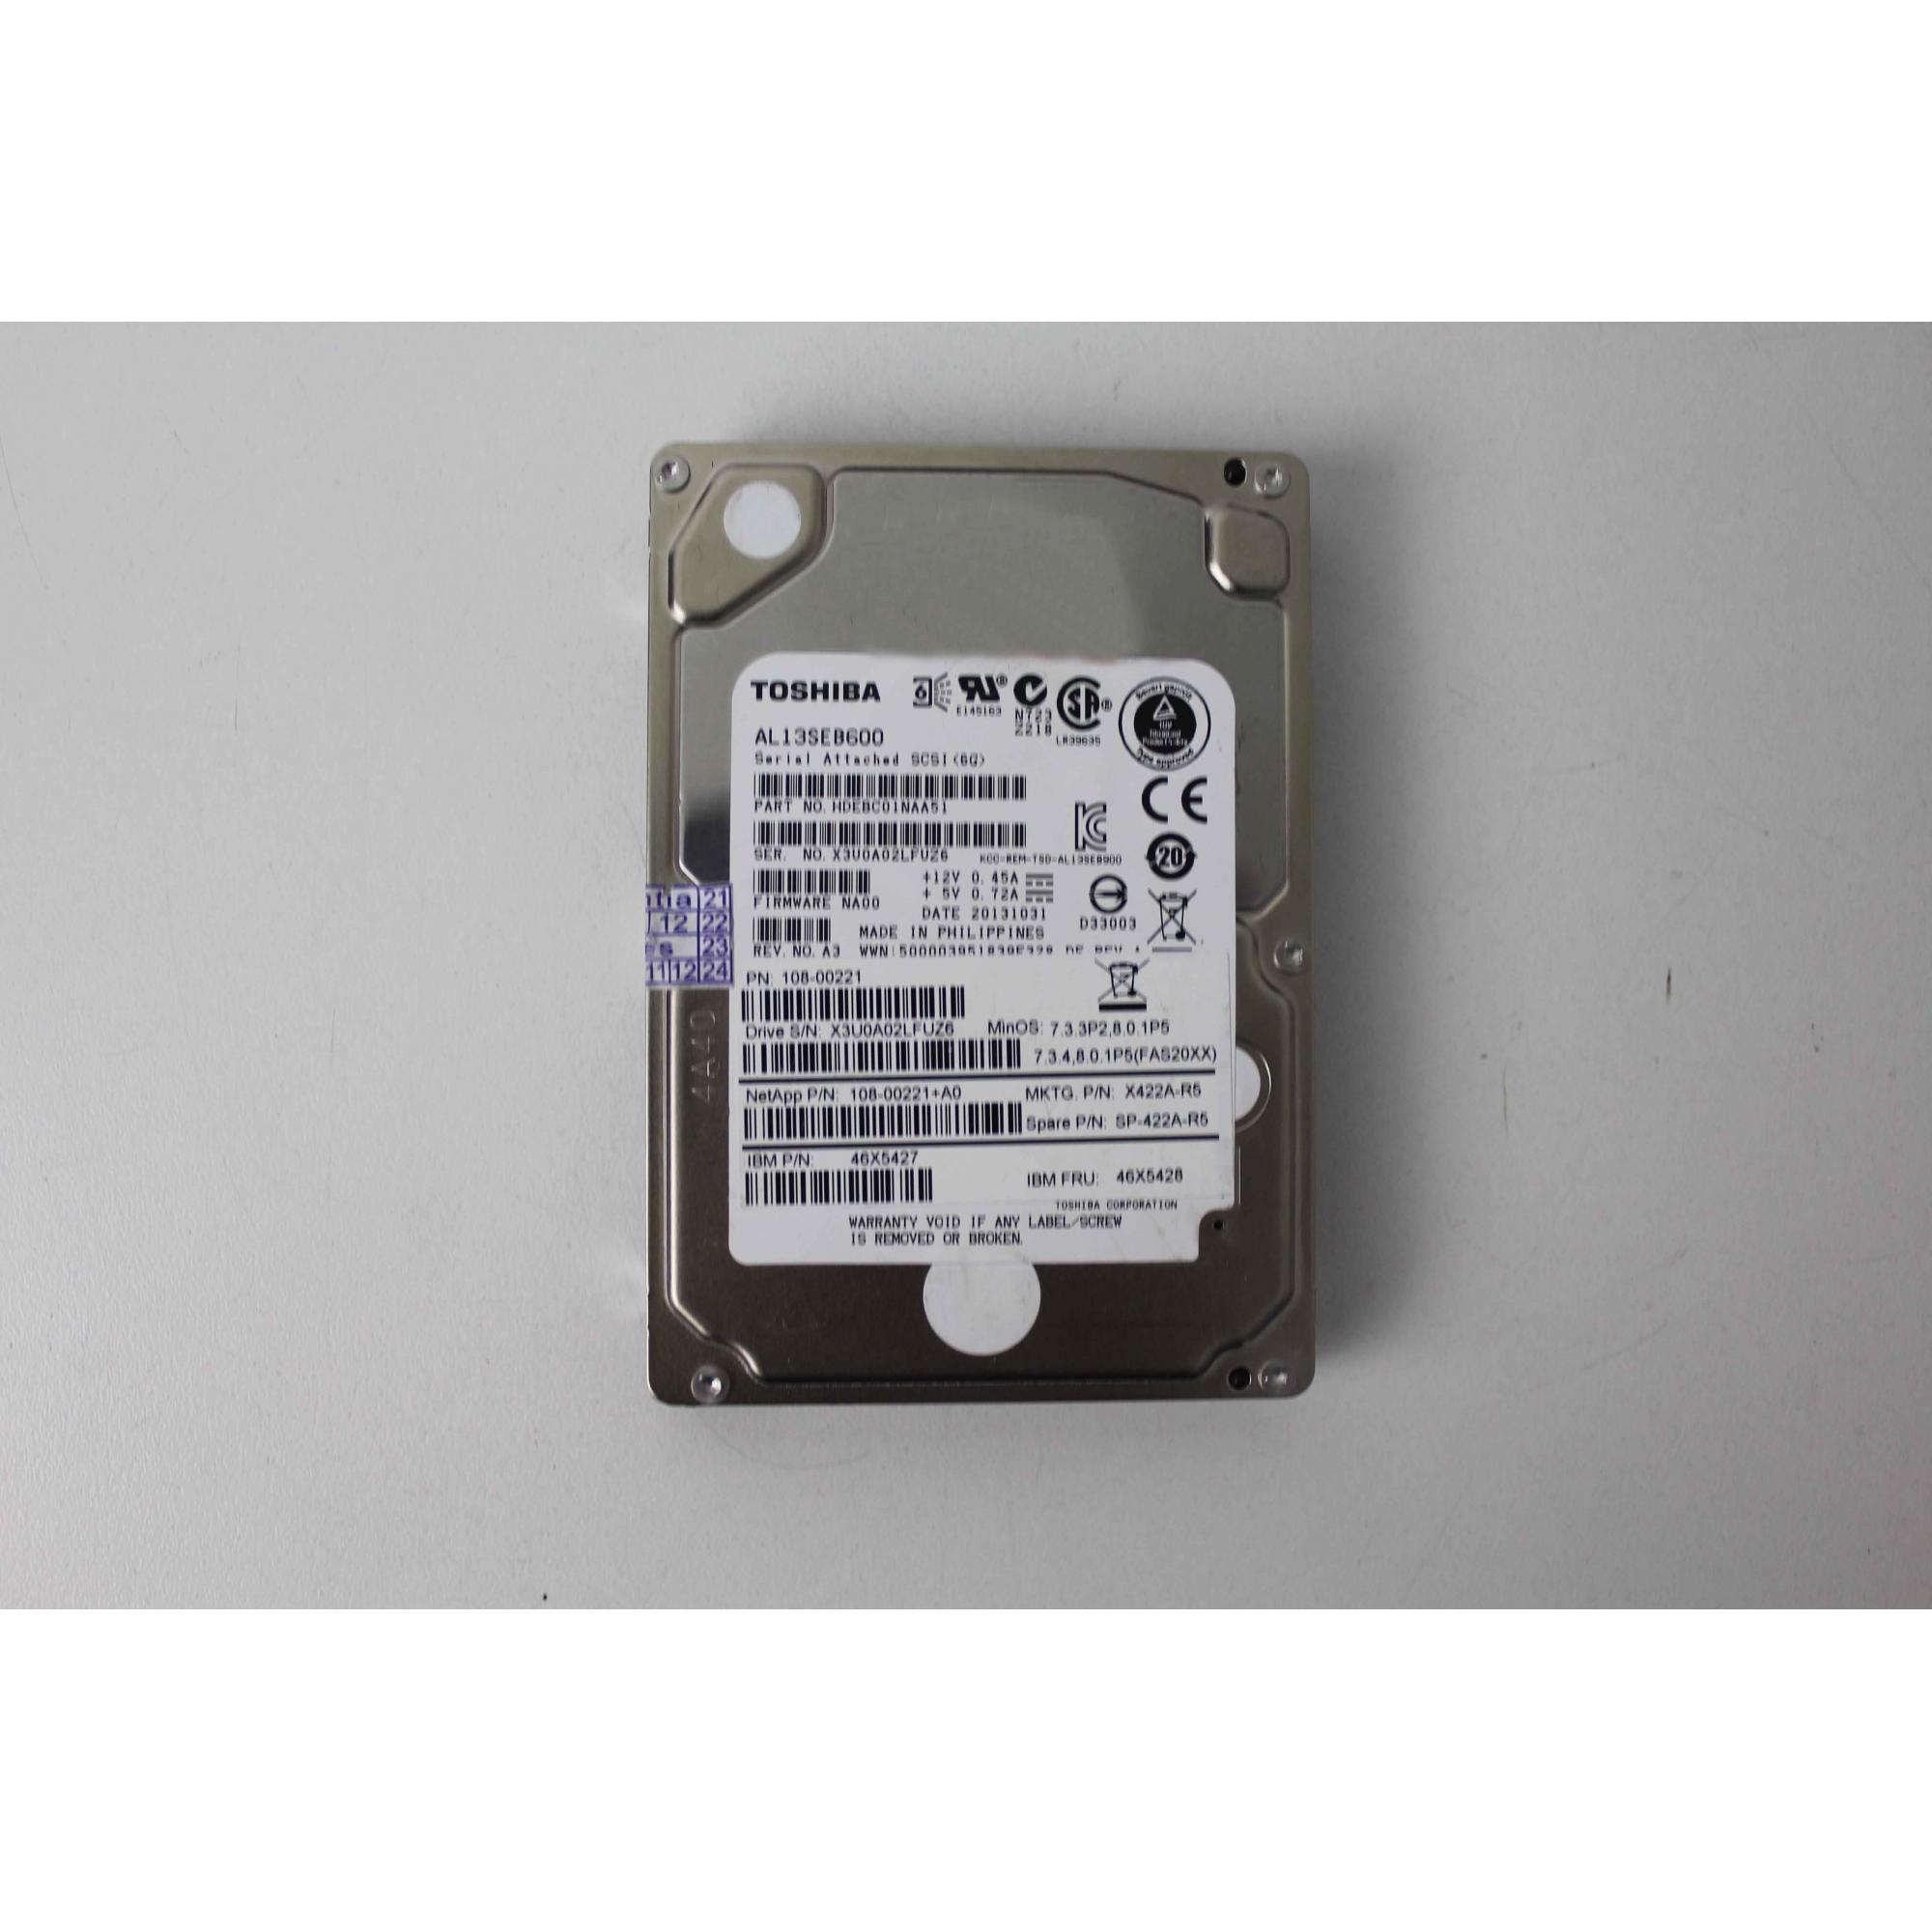 HD Toshiba 600GB SAS 6 GBPS HD PARA SERVIDORES 10K RPM